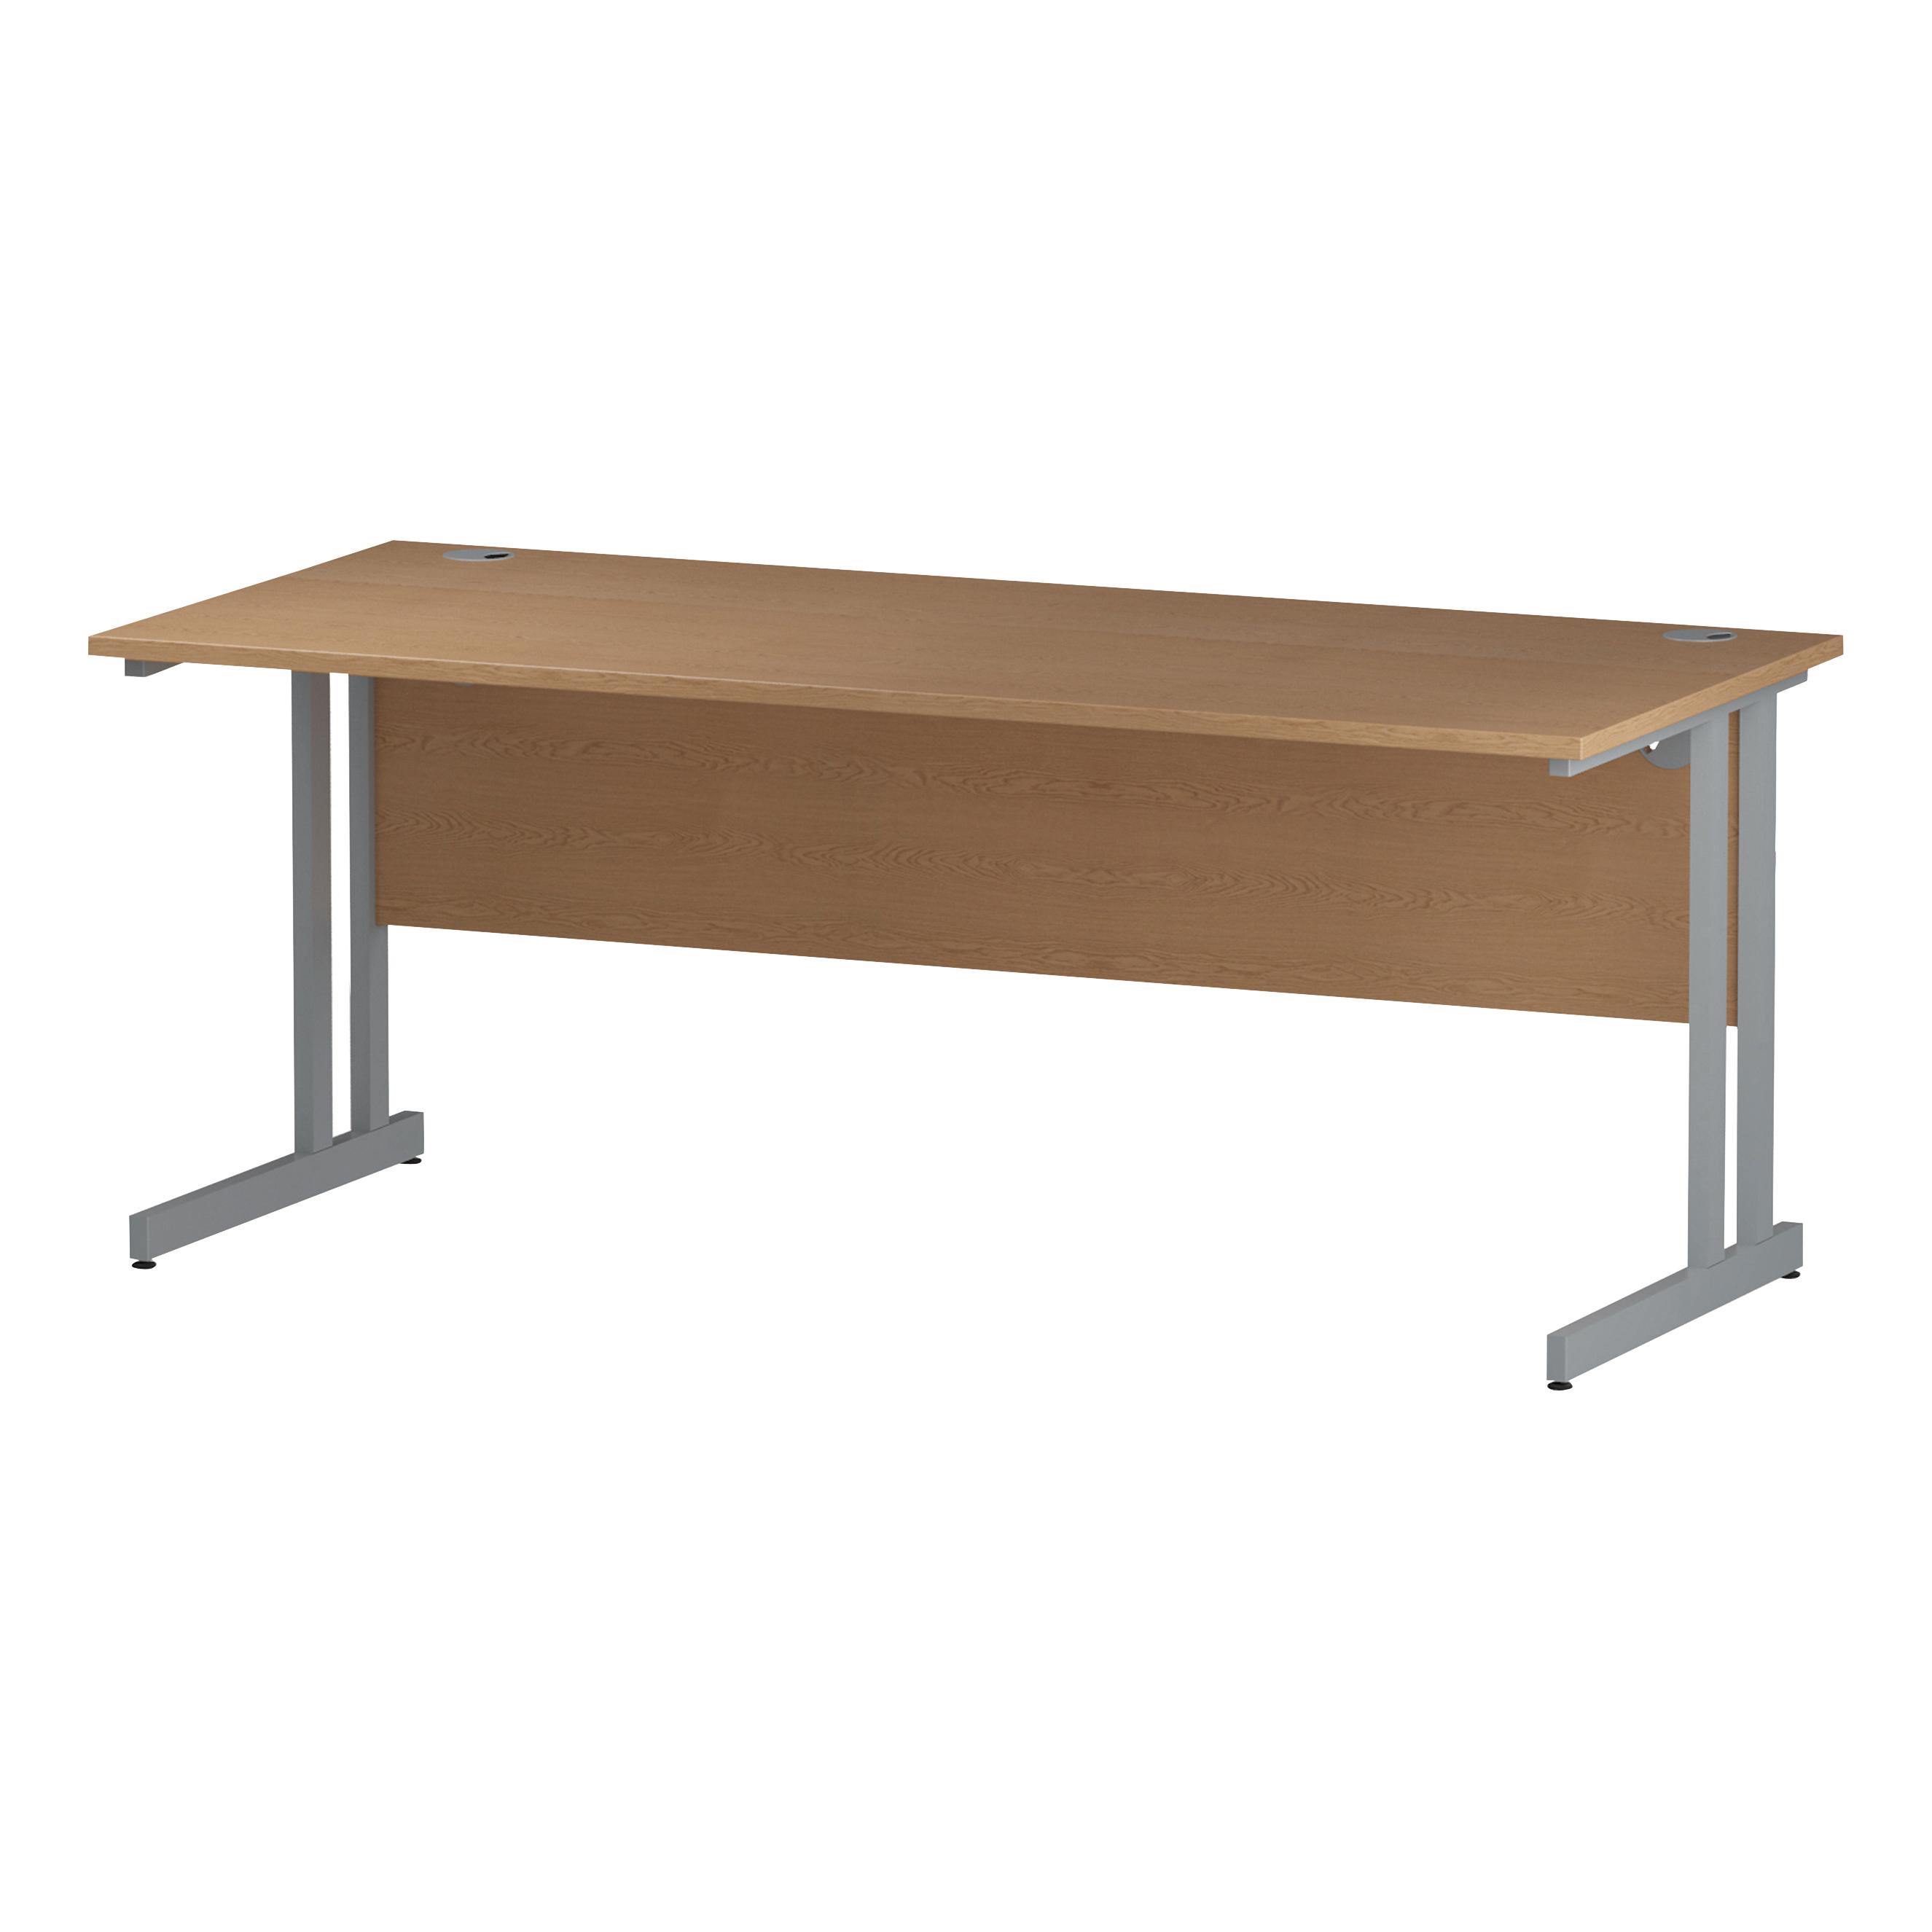 Trexus Rectangular Slim Desk Silver Cantilever Leg 1800x600mm Oak Ref I002651